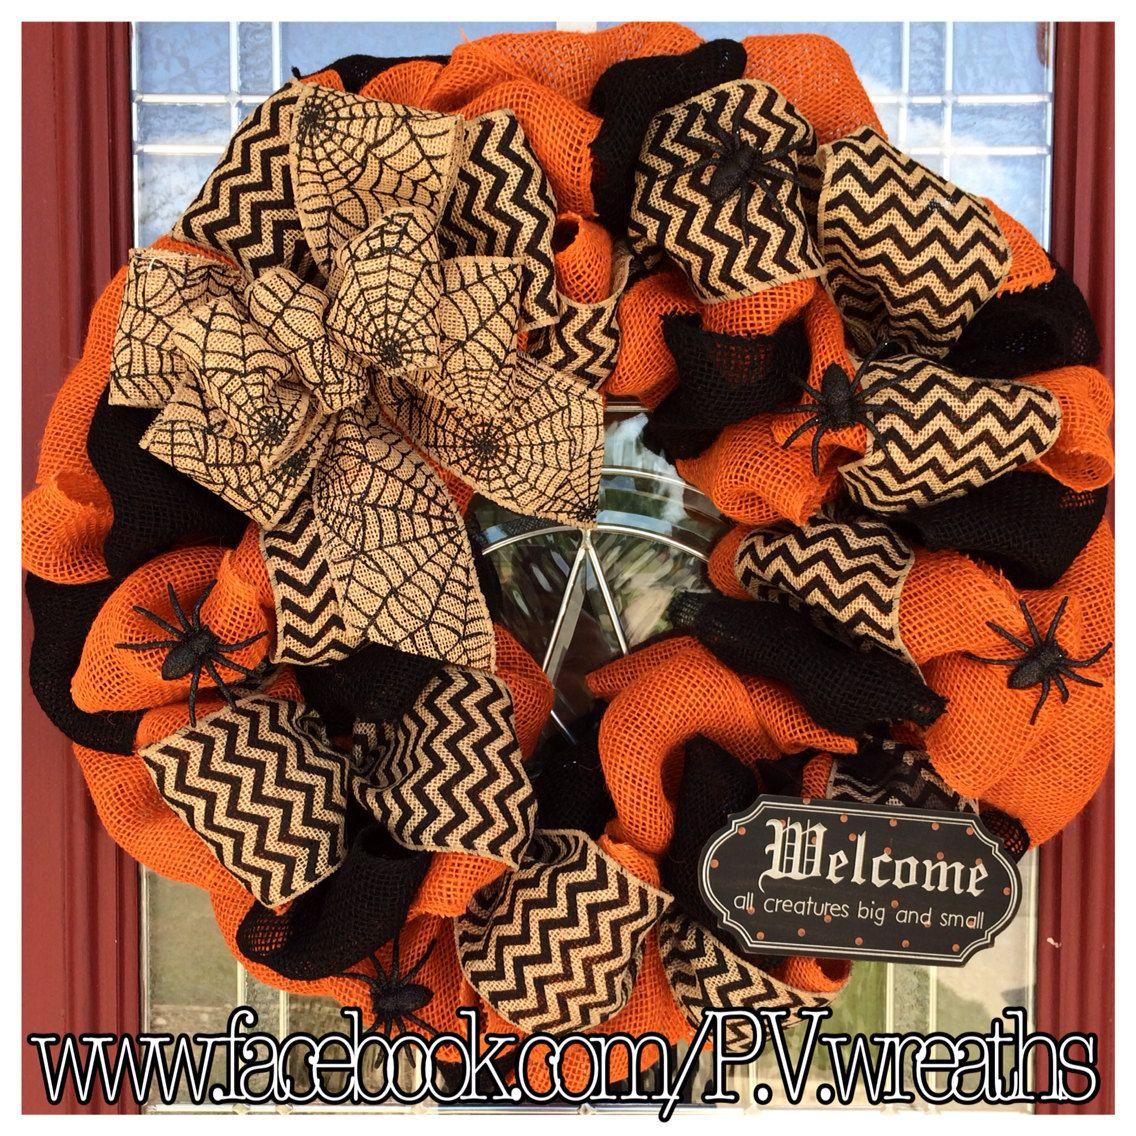 15 fearsome handmade halloween wreath designs for your front door 15 fearsome handmade halloween wreath designs for your front door rubansaba